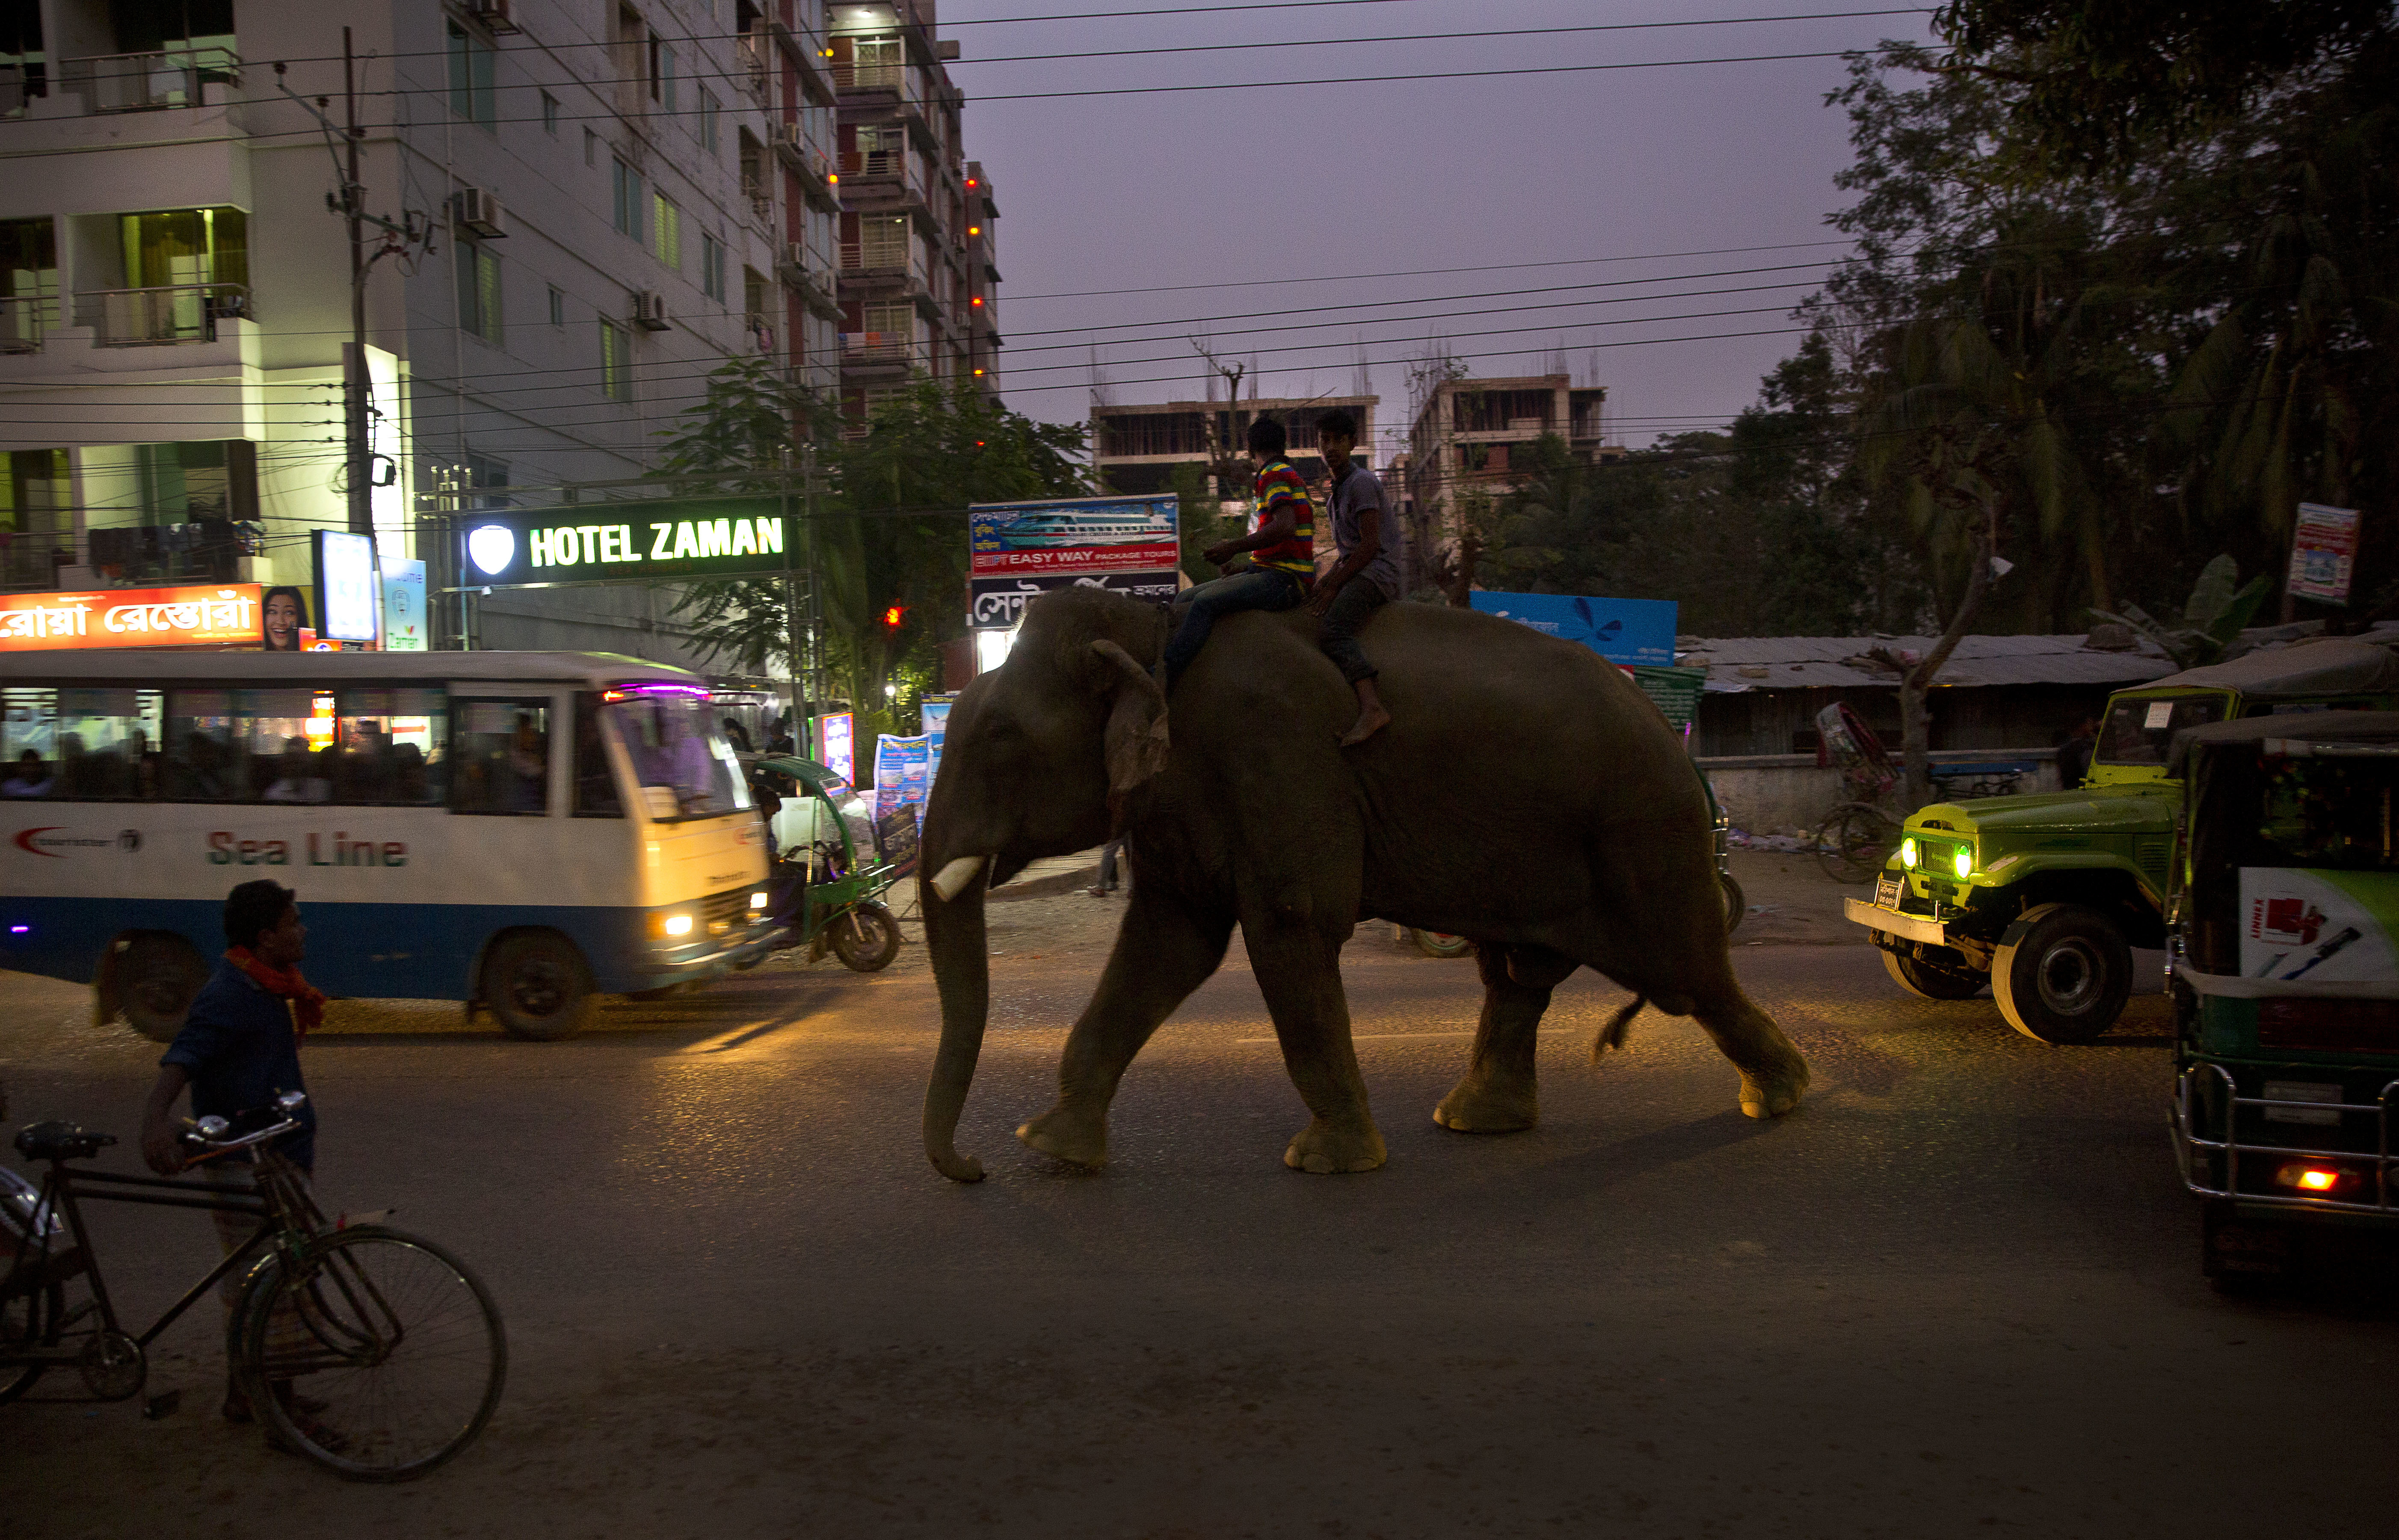 An elephant walks through a street amid traffic in Cox's Bazar, Bangladesh, Friday, Jan. 26, 2018. Miles-long beaches makes this coastal district Bangladesh's top tourist destination. (AP Photo/Manish Swarup)